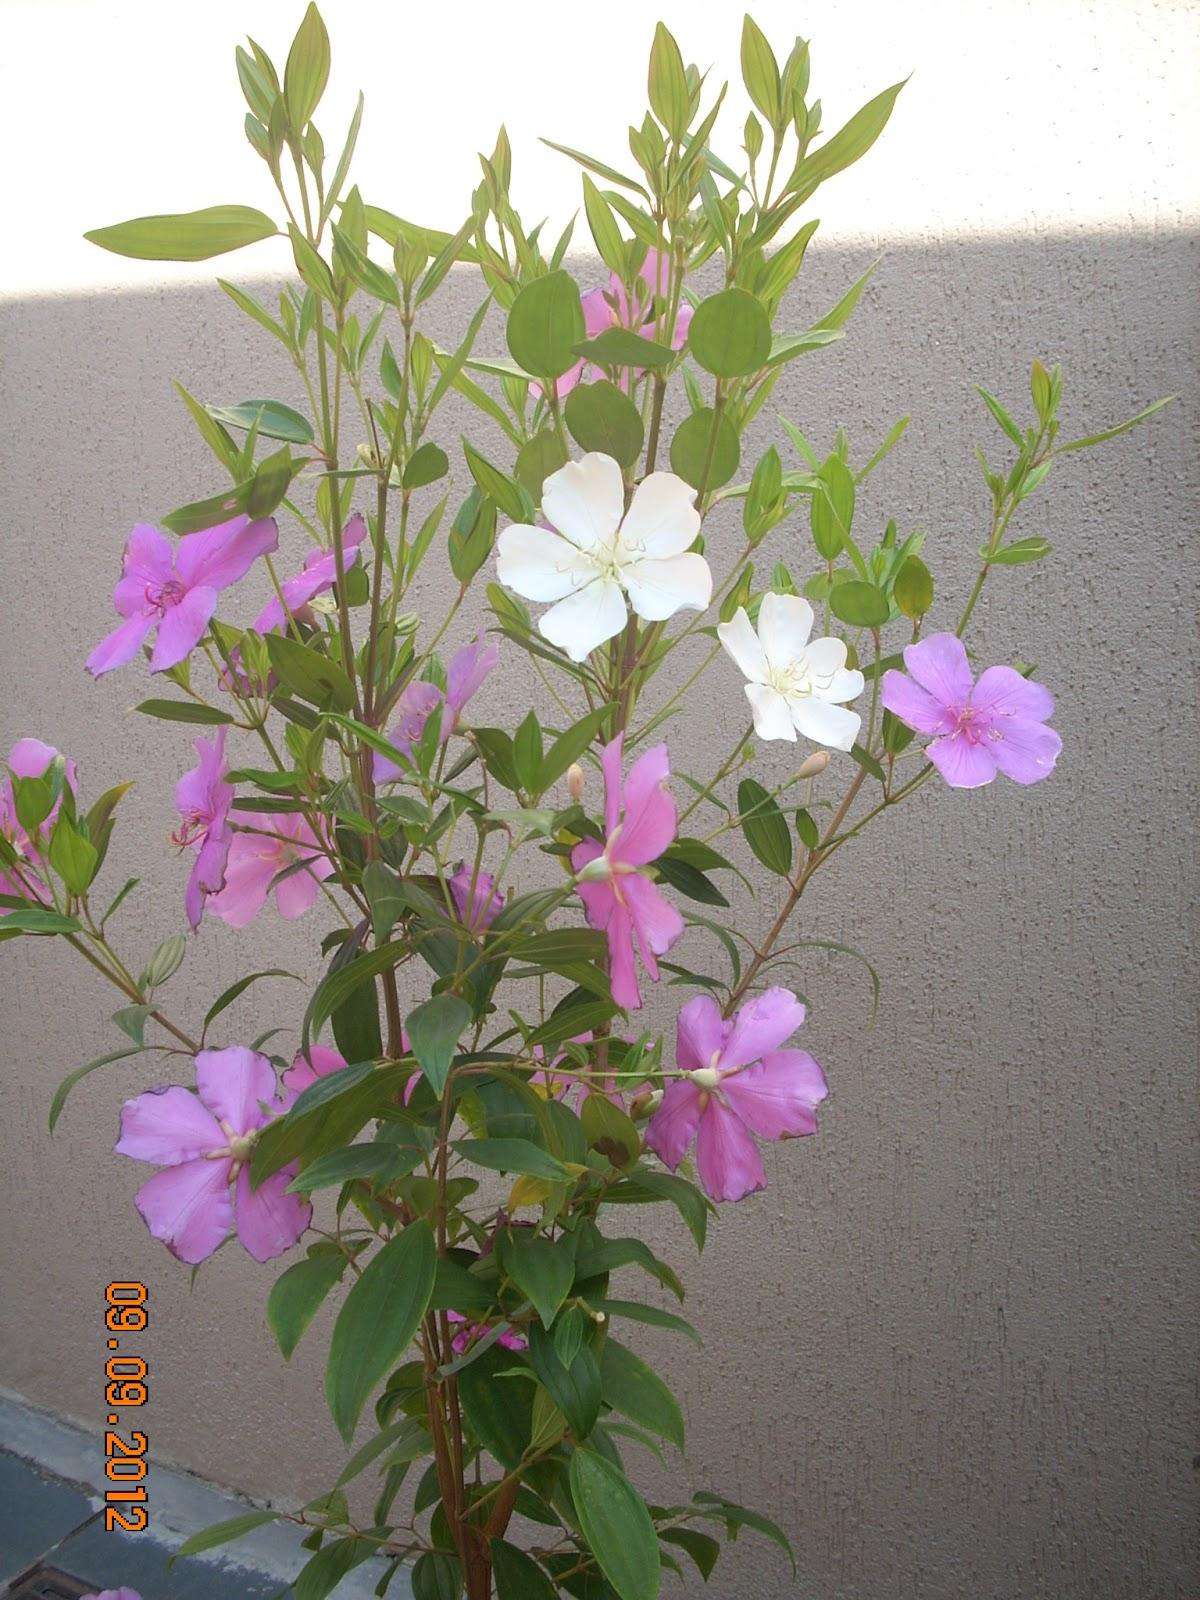 meu quintal meu jardim : meu quintal meu jardim:Coisas de Ada: Manacá da Serra no meu quintal